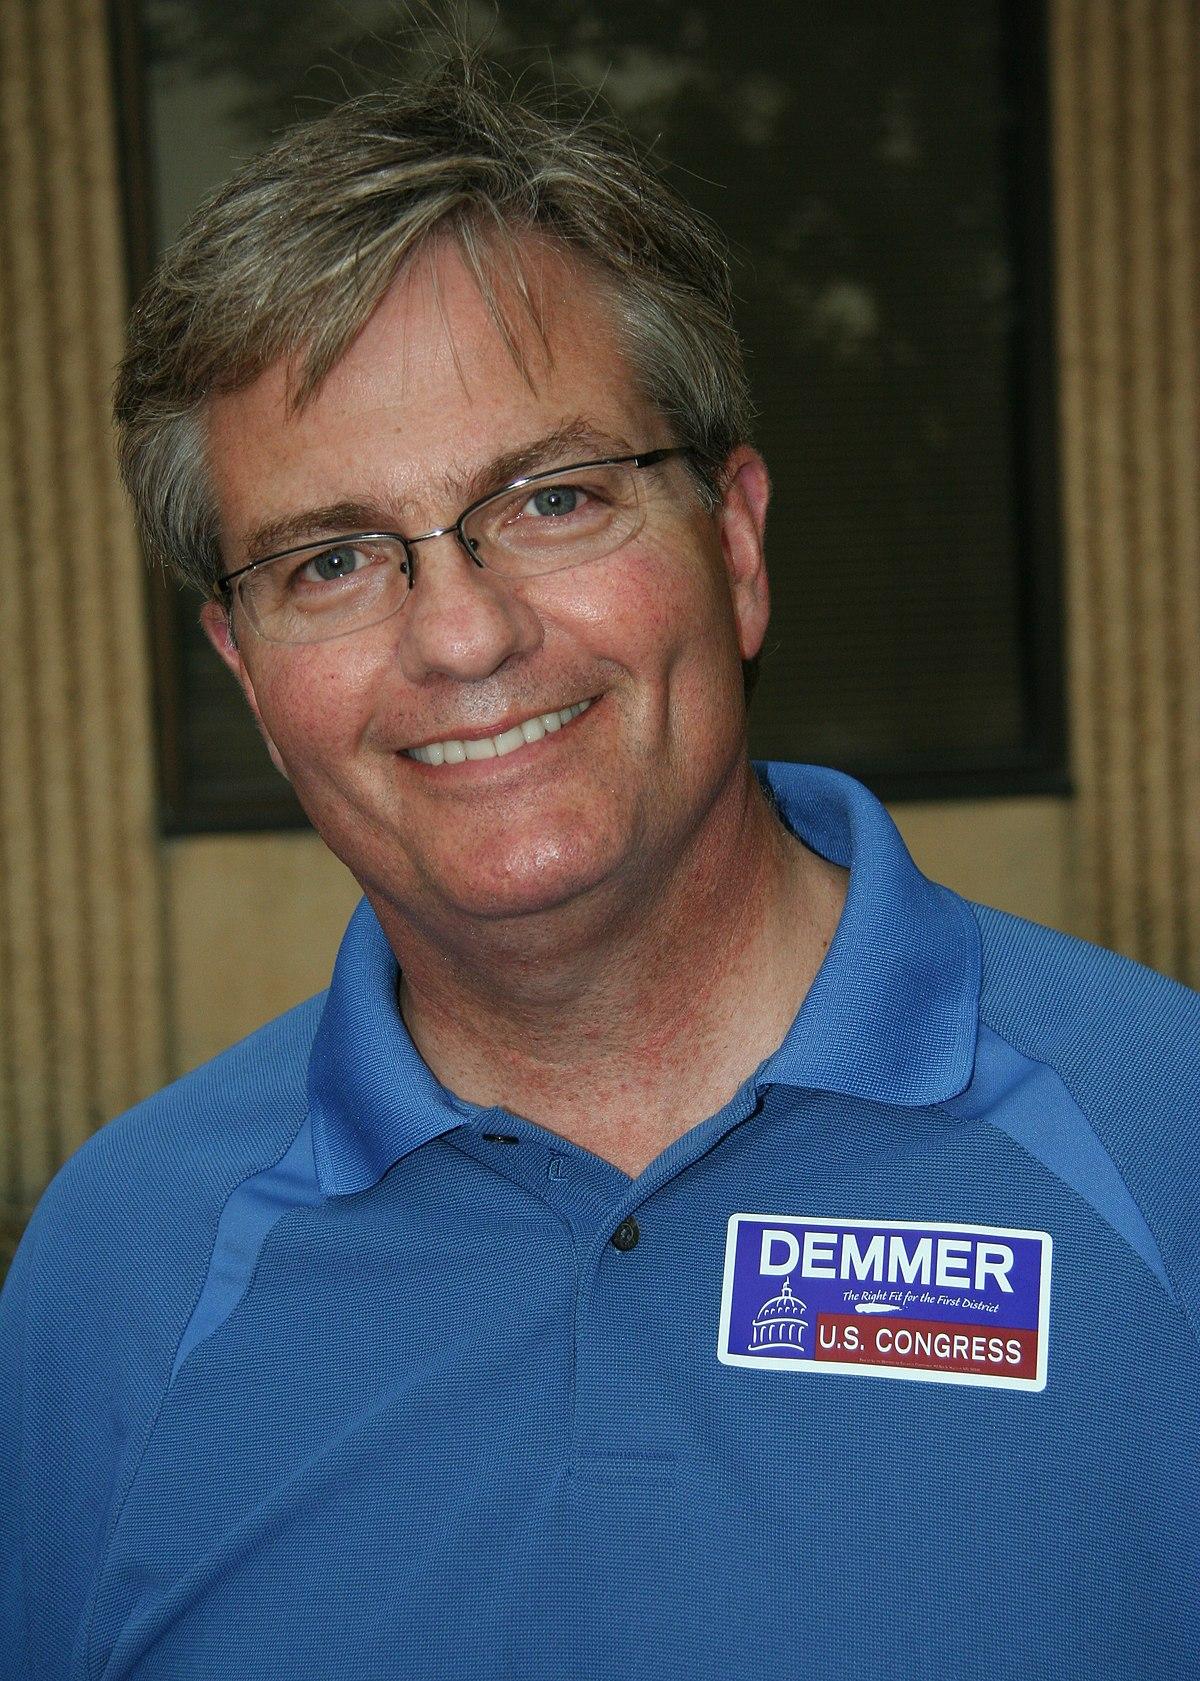 Randy Demmer - Wikipedia